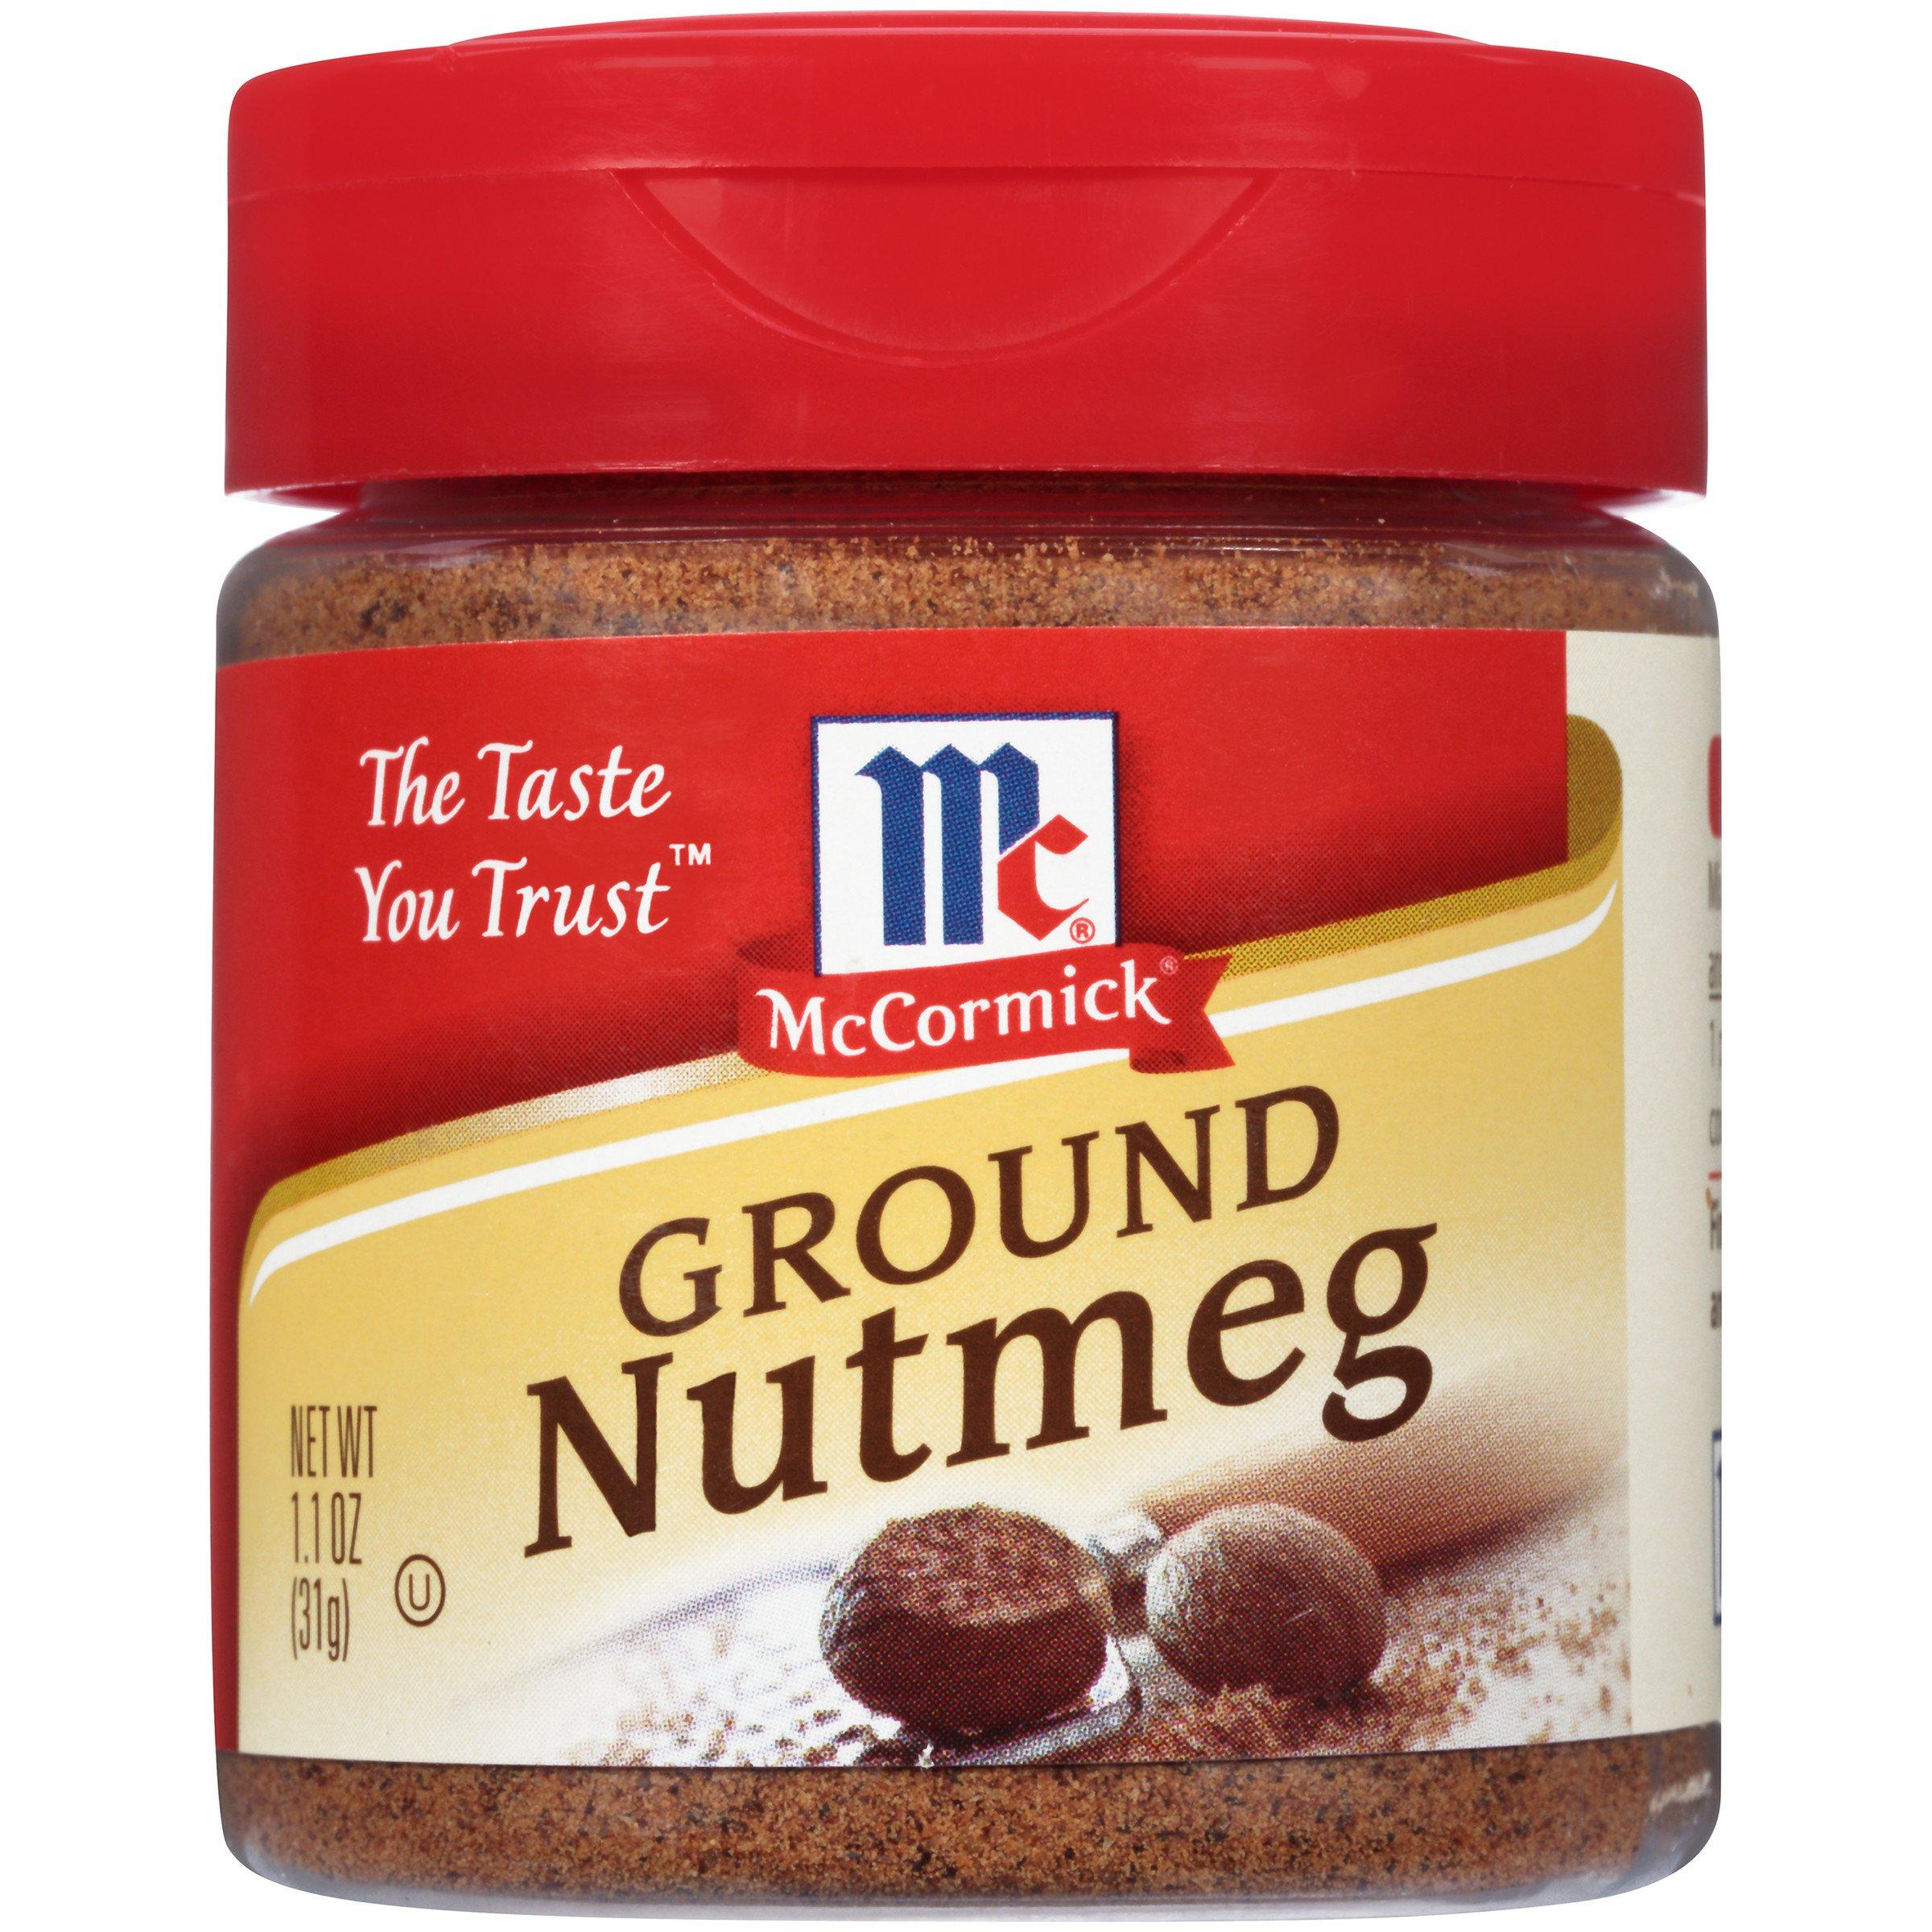 McCormick Ground Nutmeg, 1.1 oz by McCormick (Image #1)